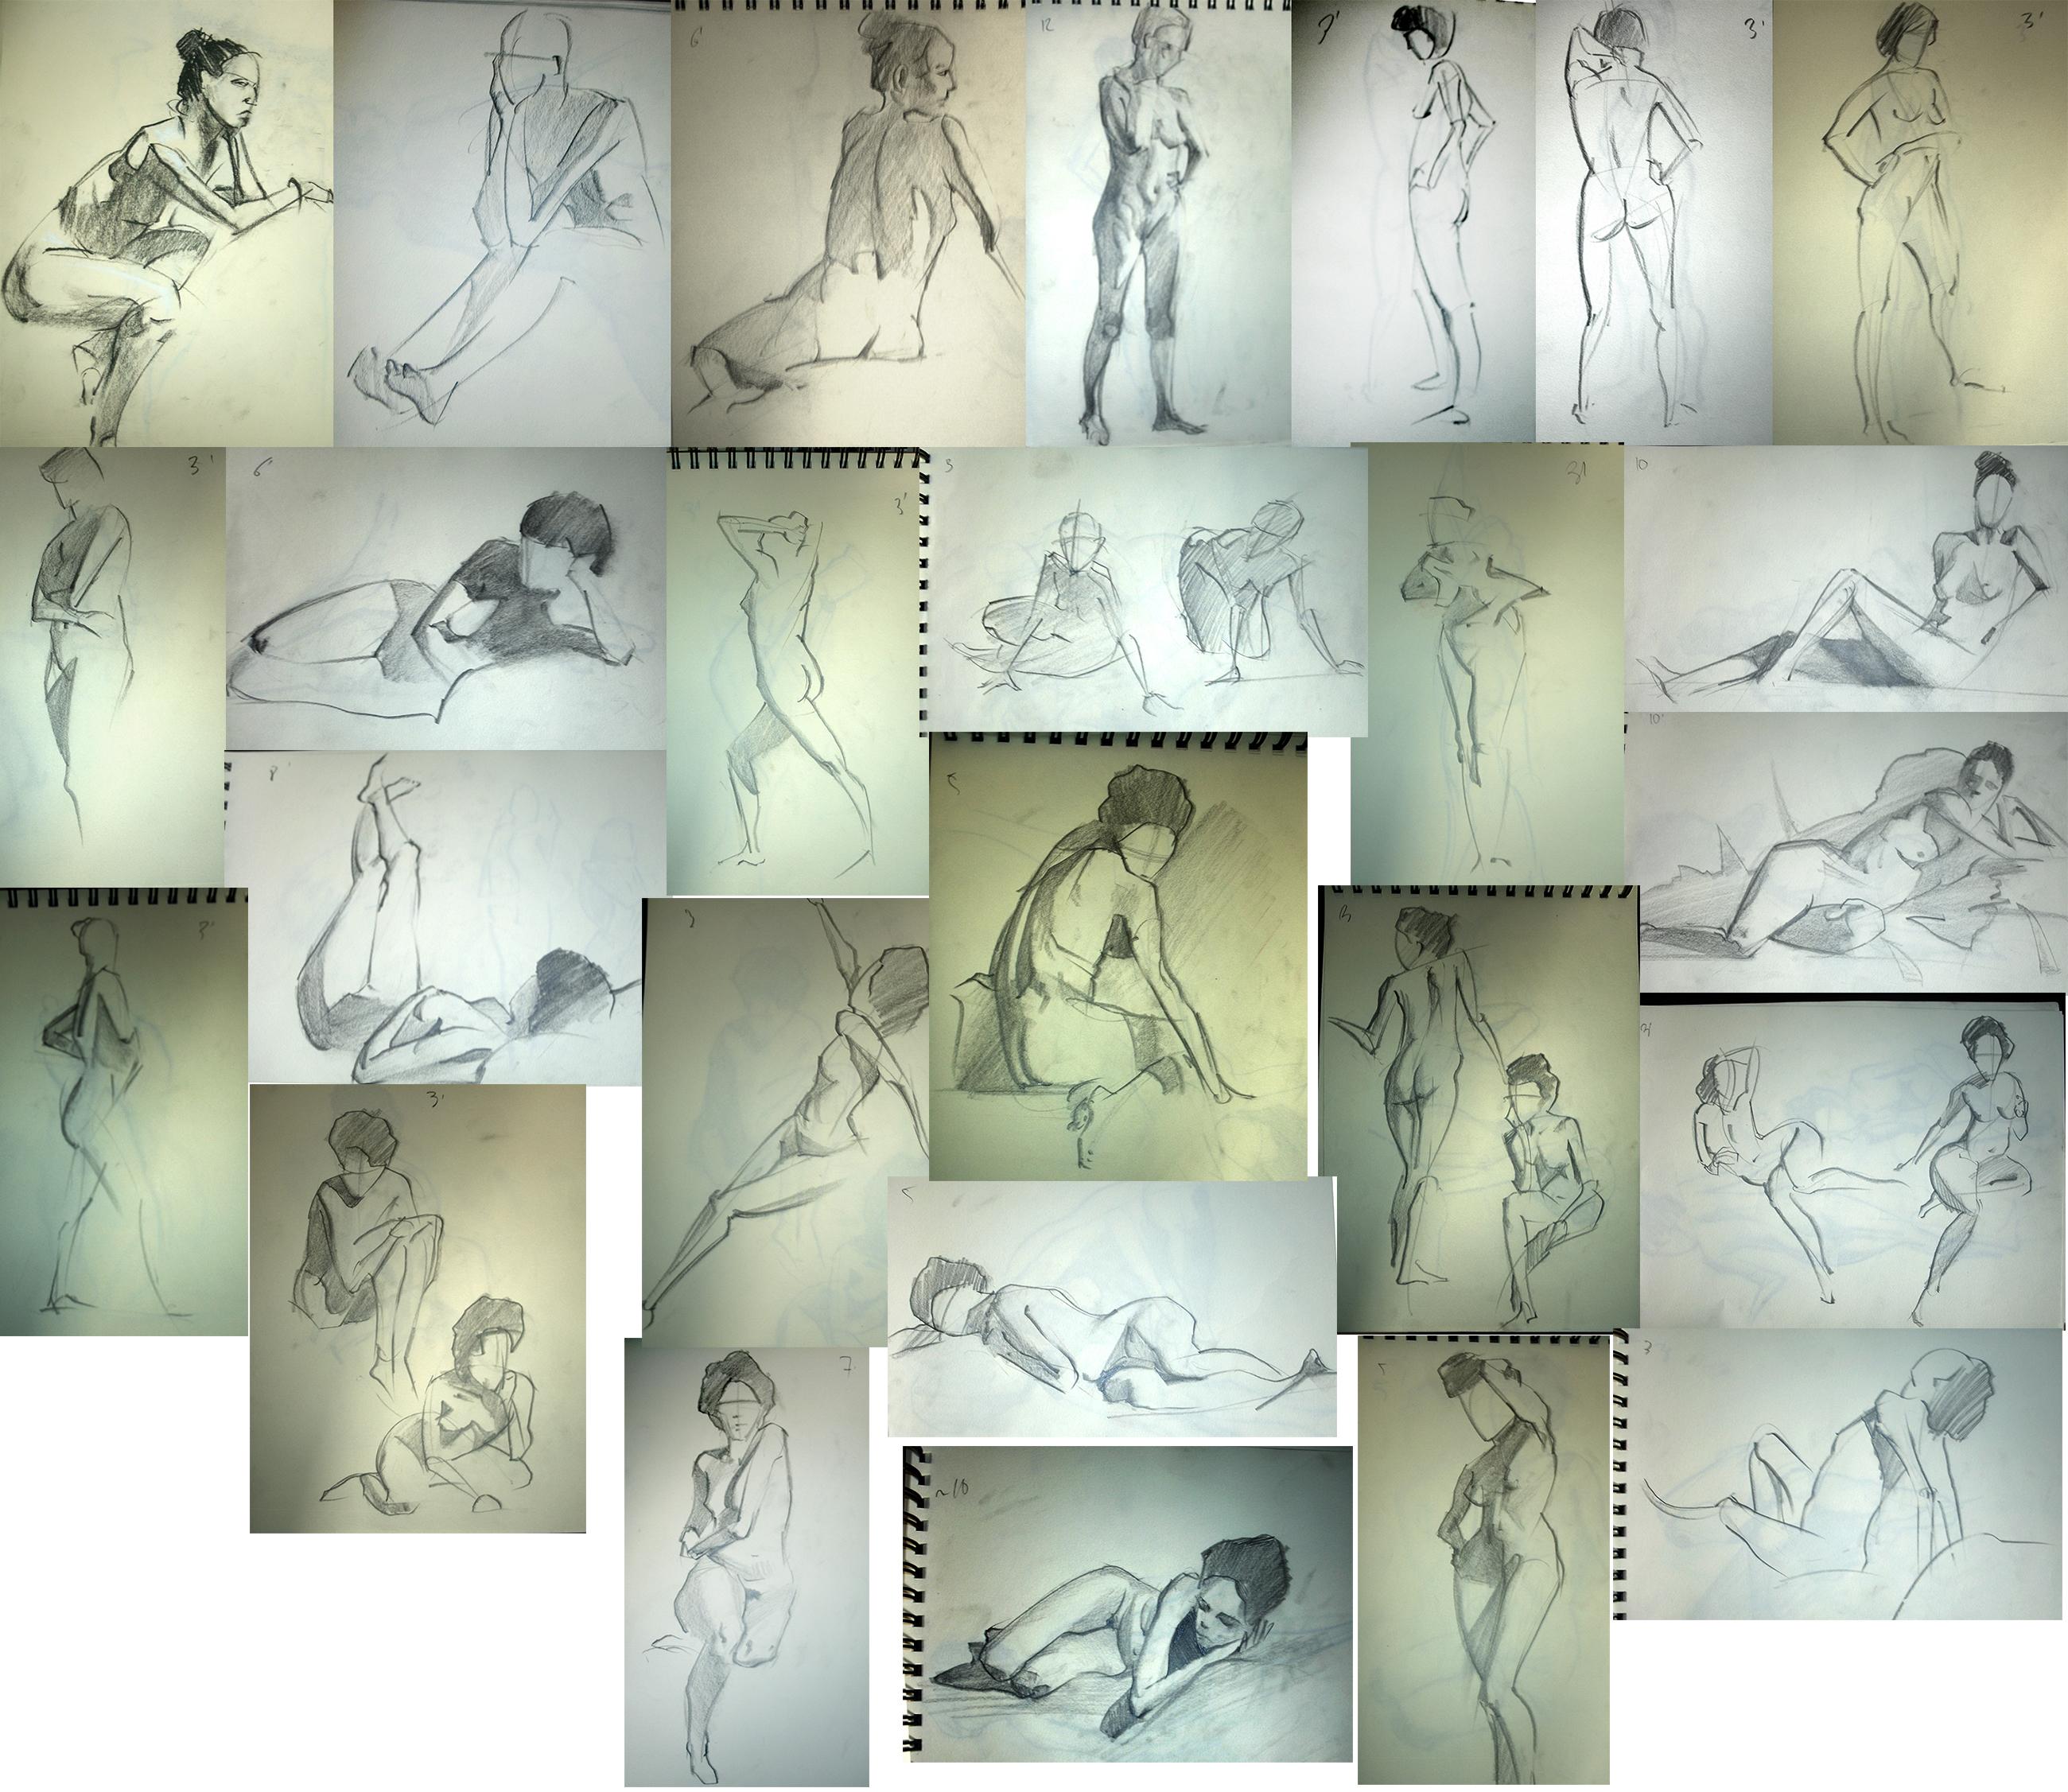 Etudes de Phosphene - Page 9 Untitled-1-4412201